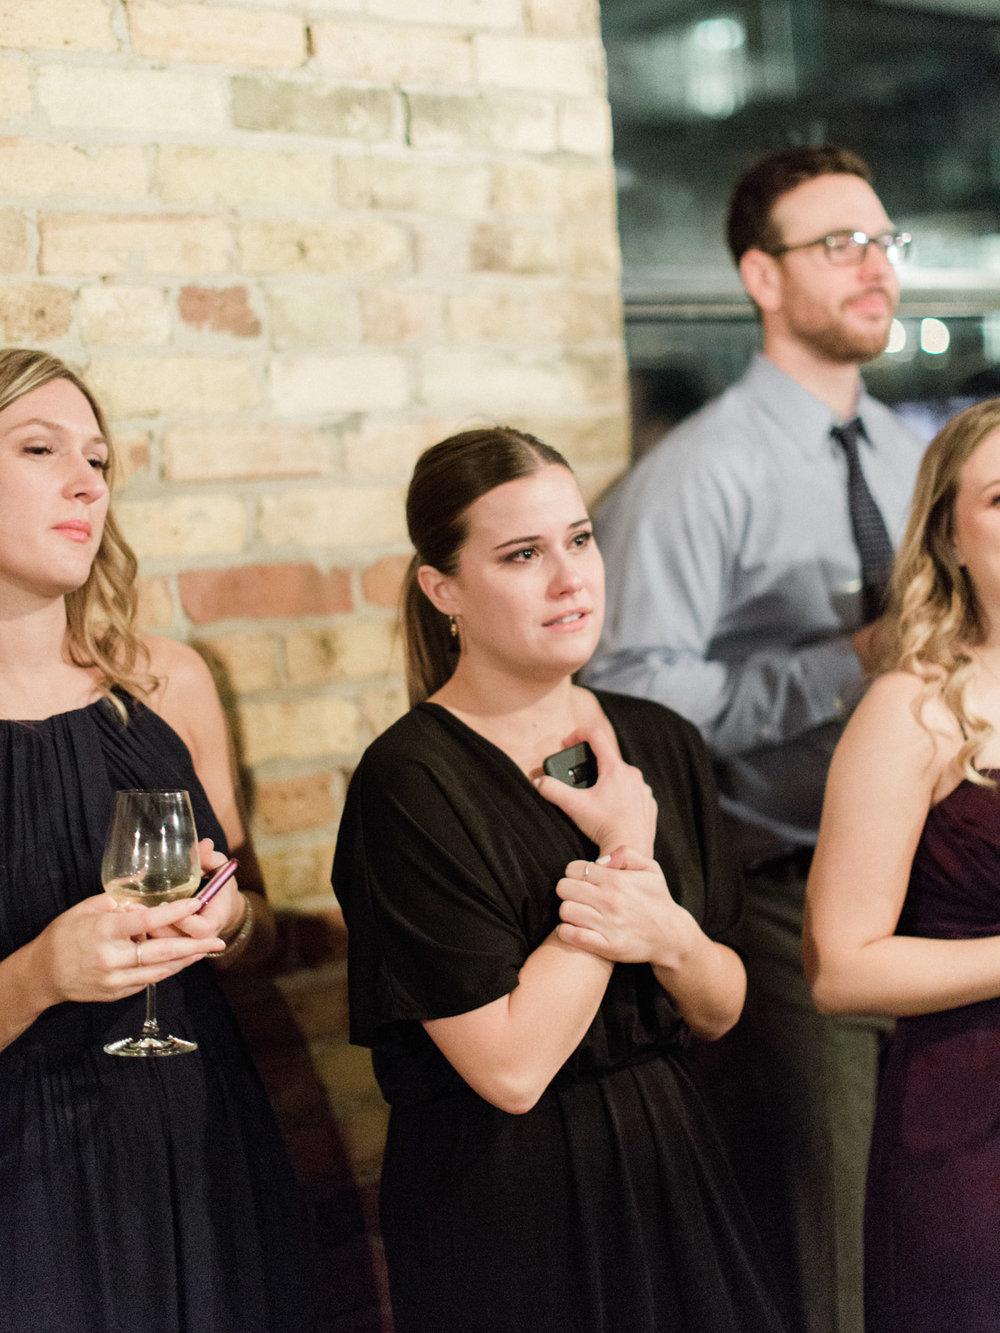 Toronto-wedding-photographer-intimate-italian-the-burroughes-downtown162.jpg